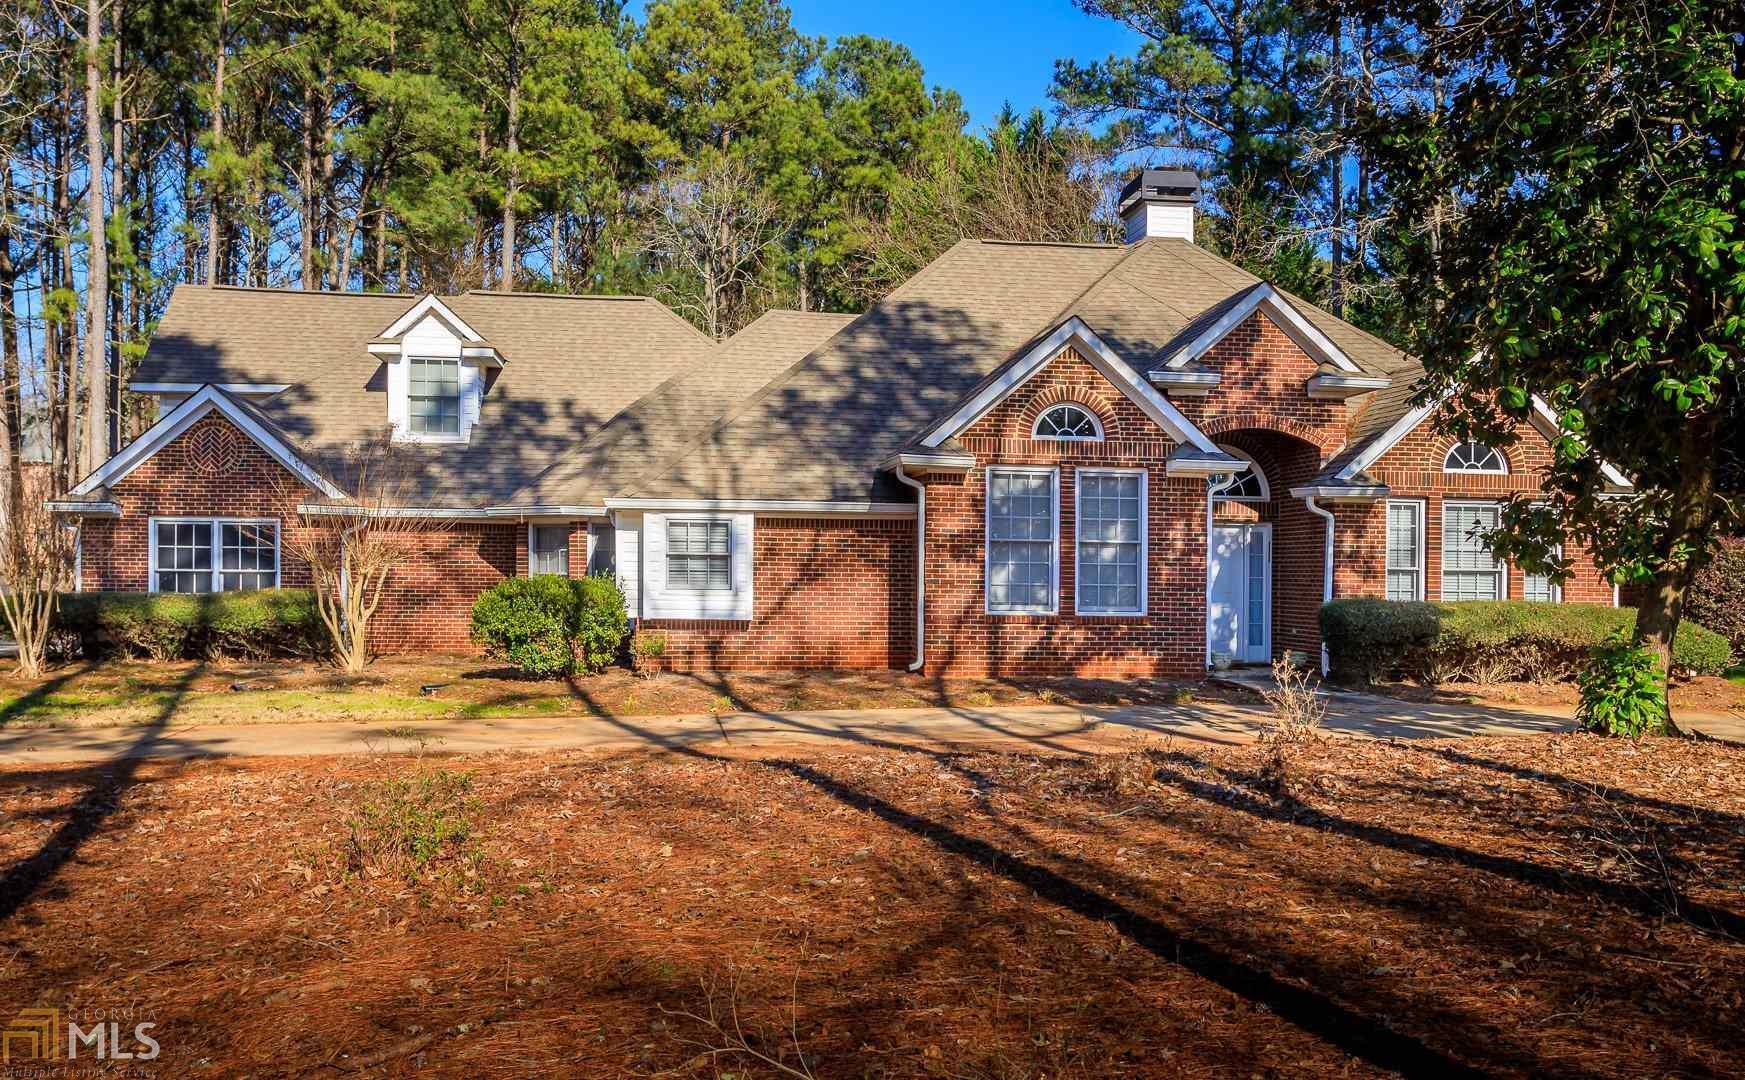 165 Old Plantation Way, Fayetteville, GA | MLS# 8517872 | Chapman